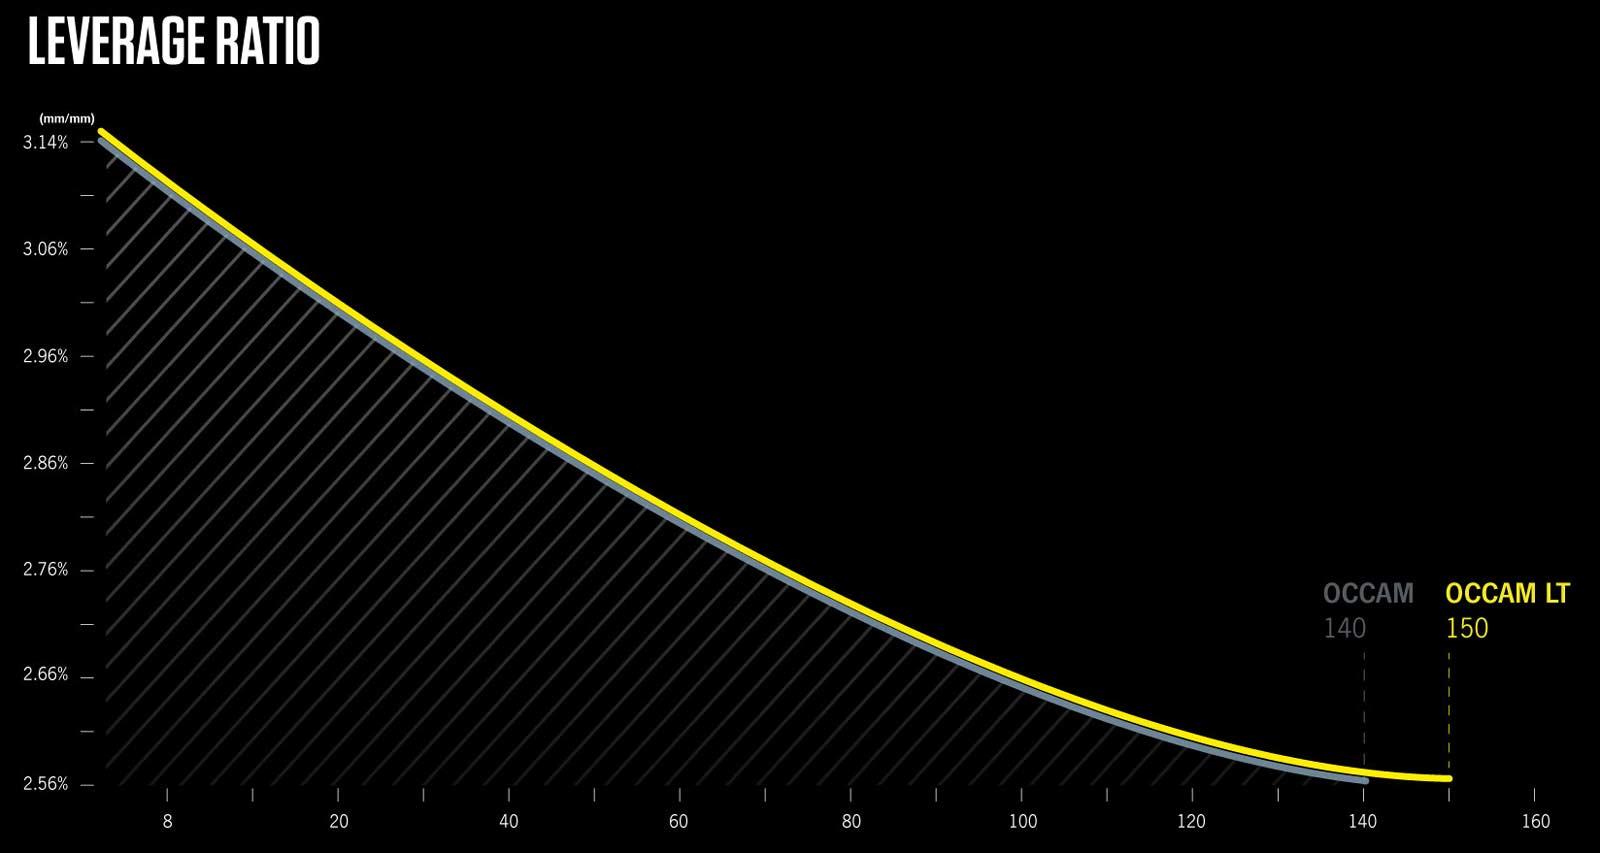 2022 orbea occam lt leverage curve